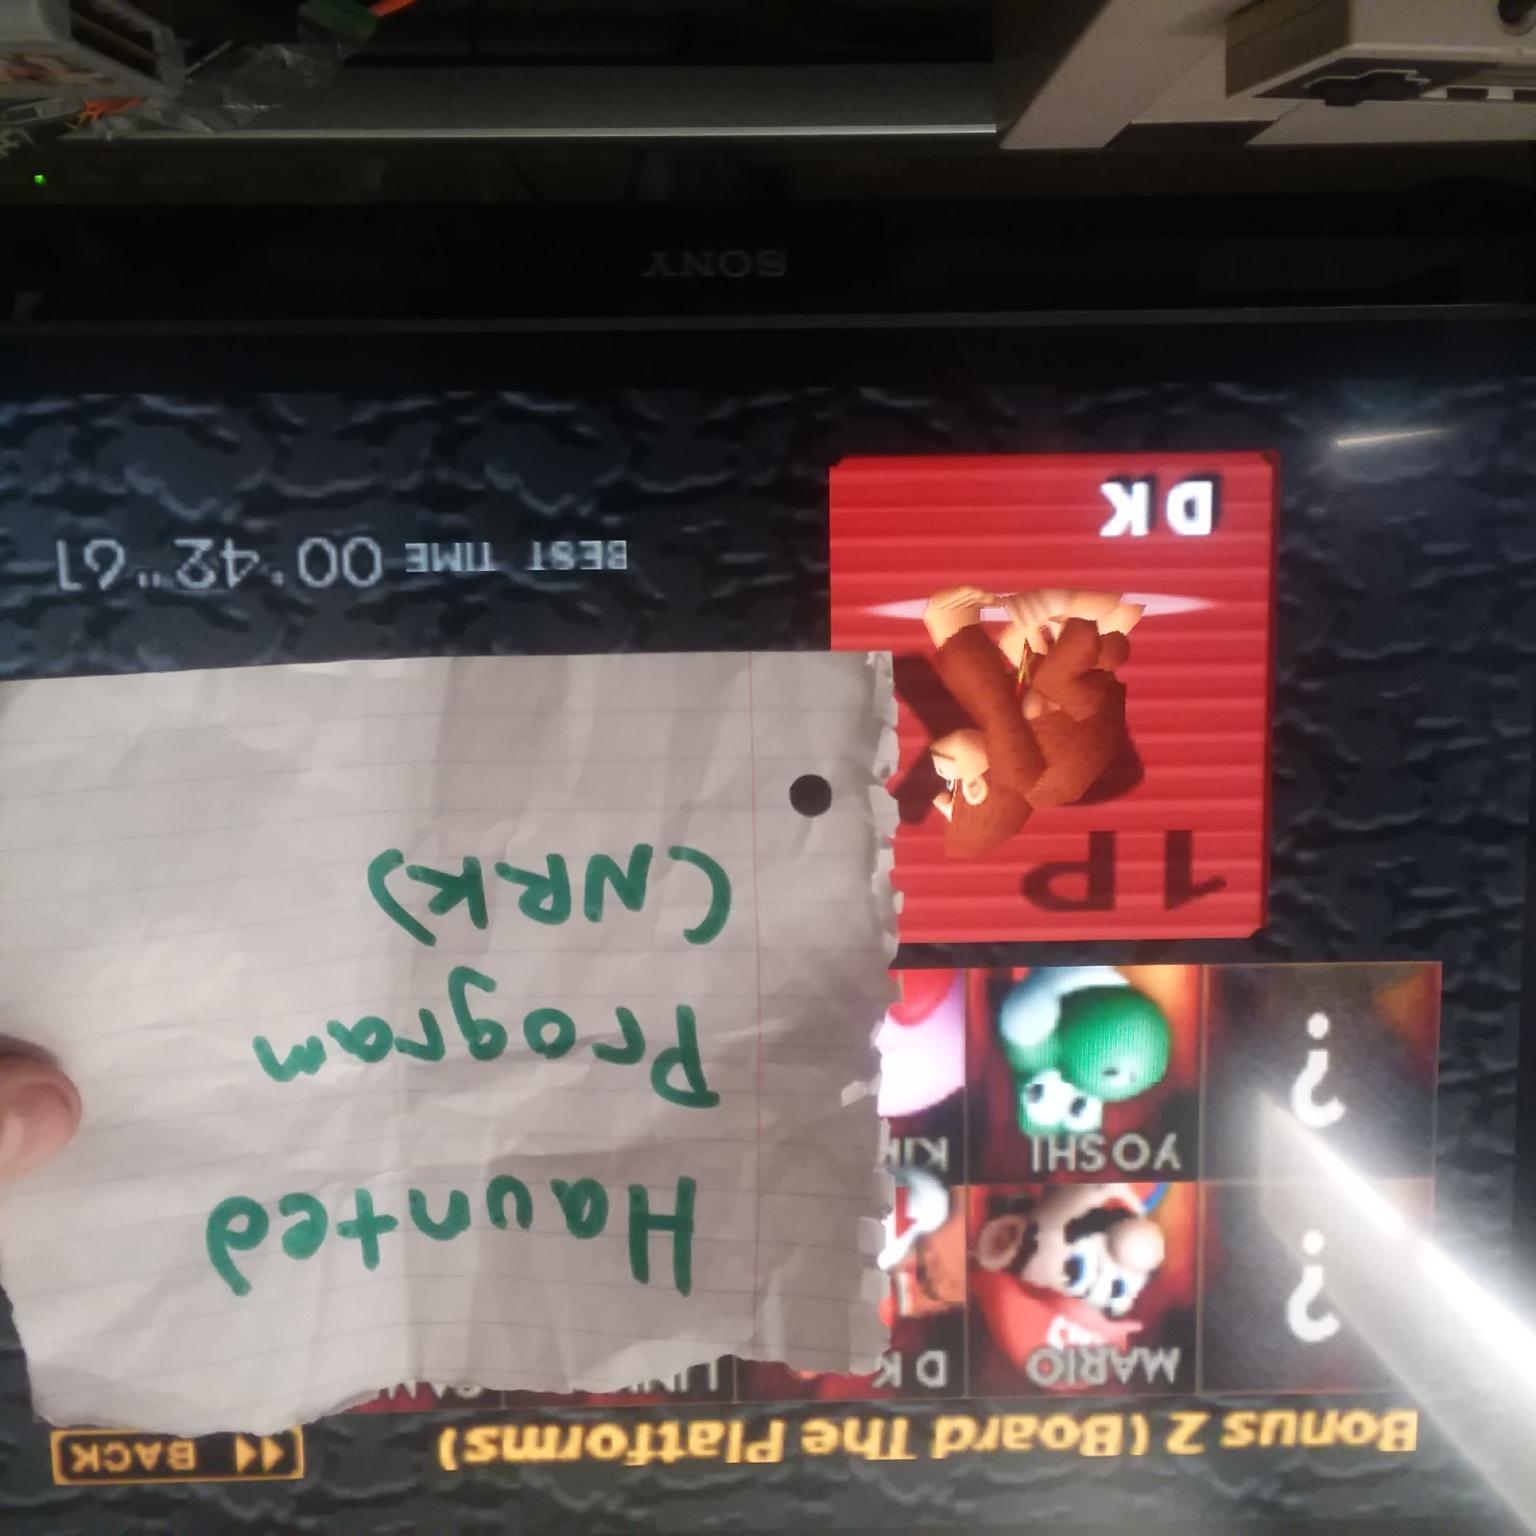 Super Smash Bros. [Board The Platforms: Donkey Kong] time of 0:00:42.61